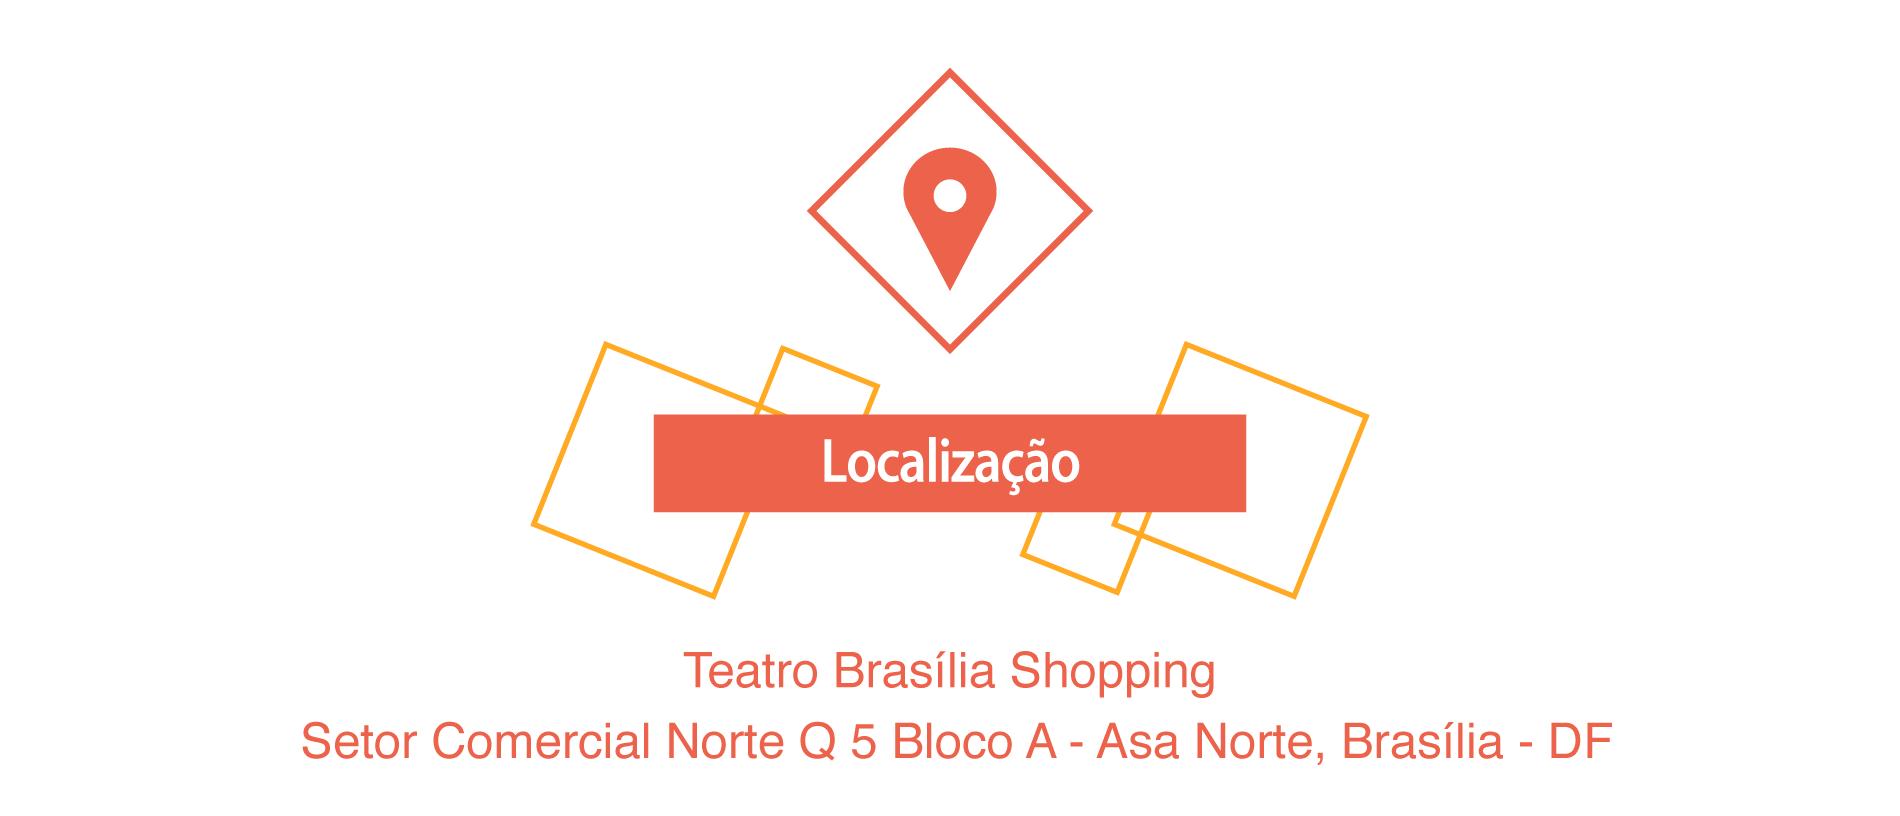 https://www.mestregp.com.br/wp-content/uploads/2018/02/pagina-forumbra-localizaccca7acc83o-1900x816.png